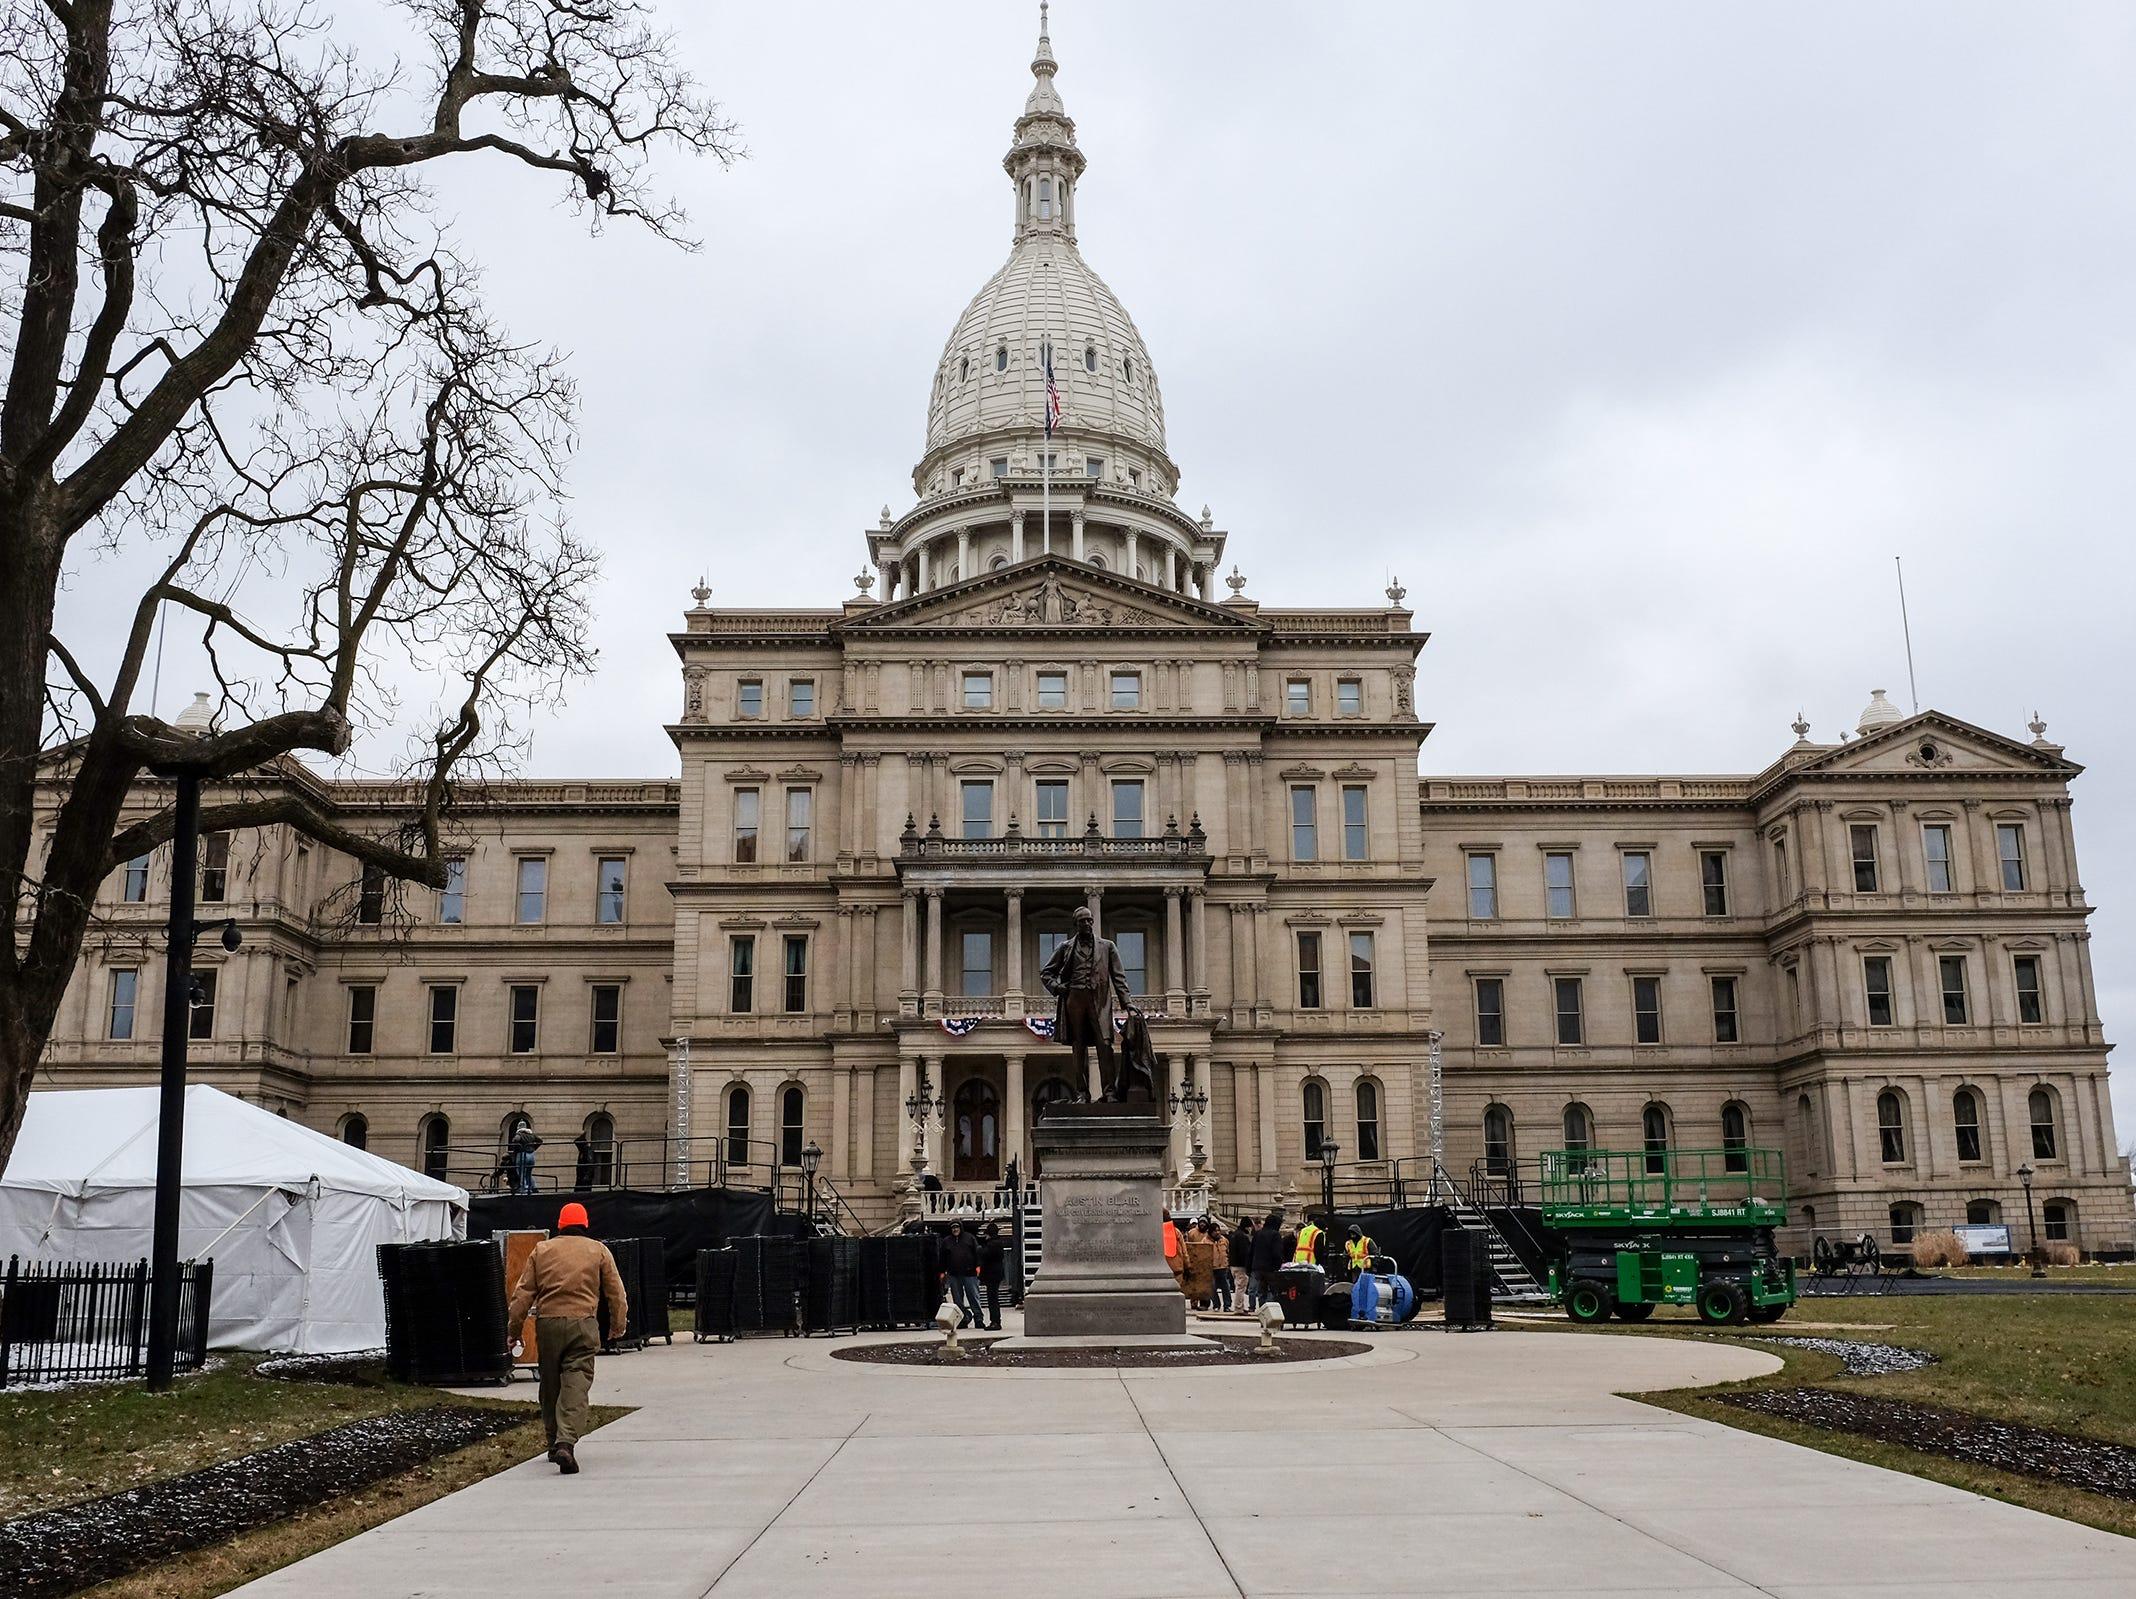 Workmen continue preparing for the Governor's inauguration at the state Capitol Saturday, Dec. 29, 2018.